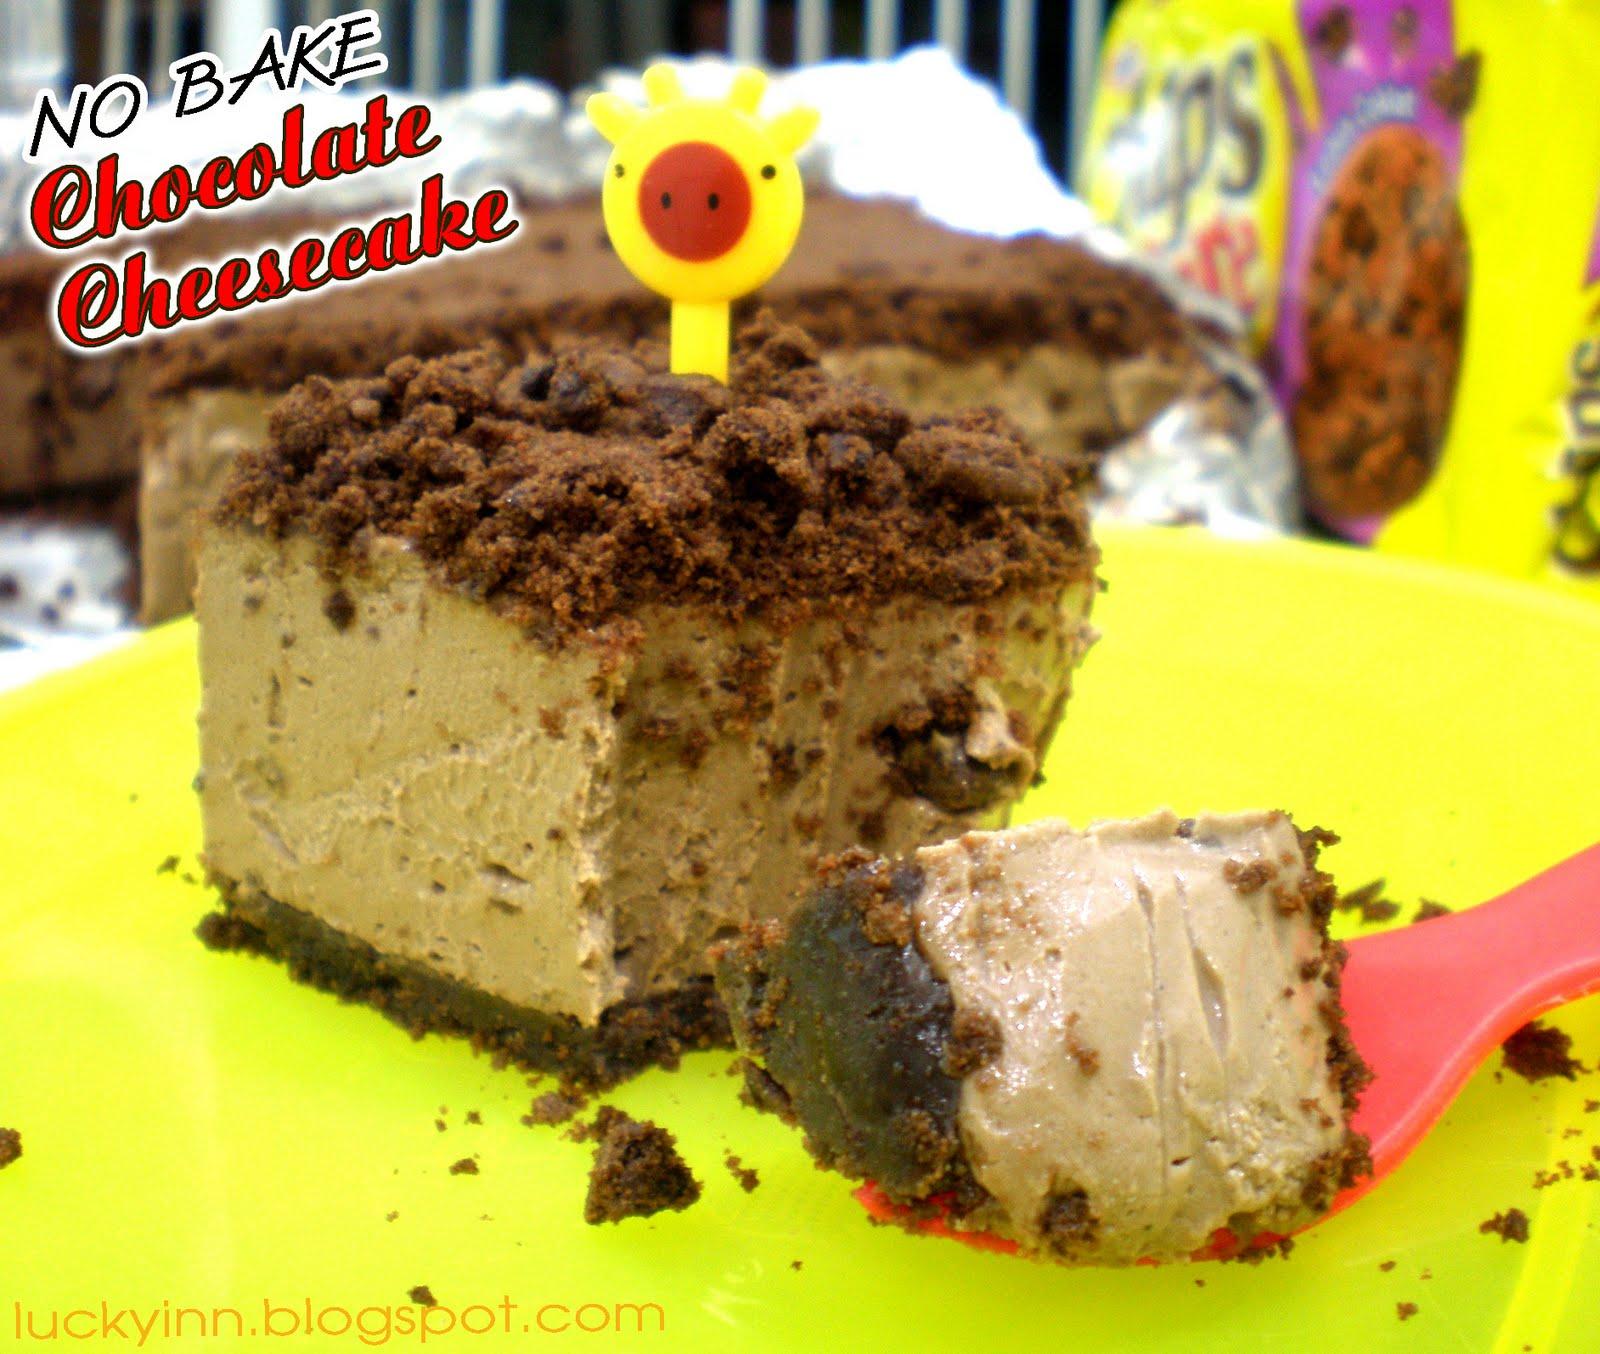 Lucky Inn: No Bake Chocolate Cheesecake